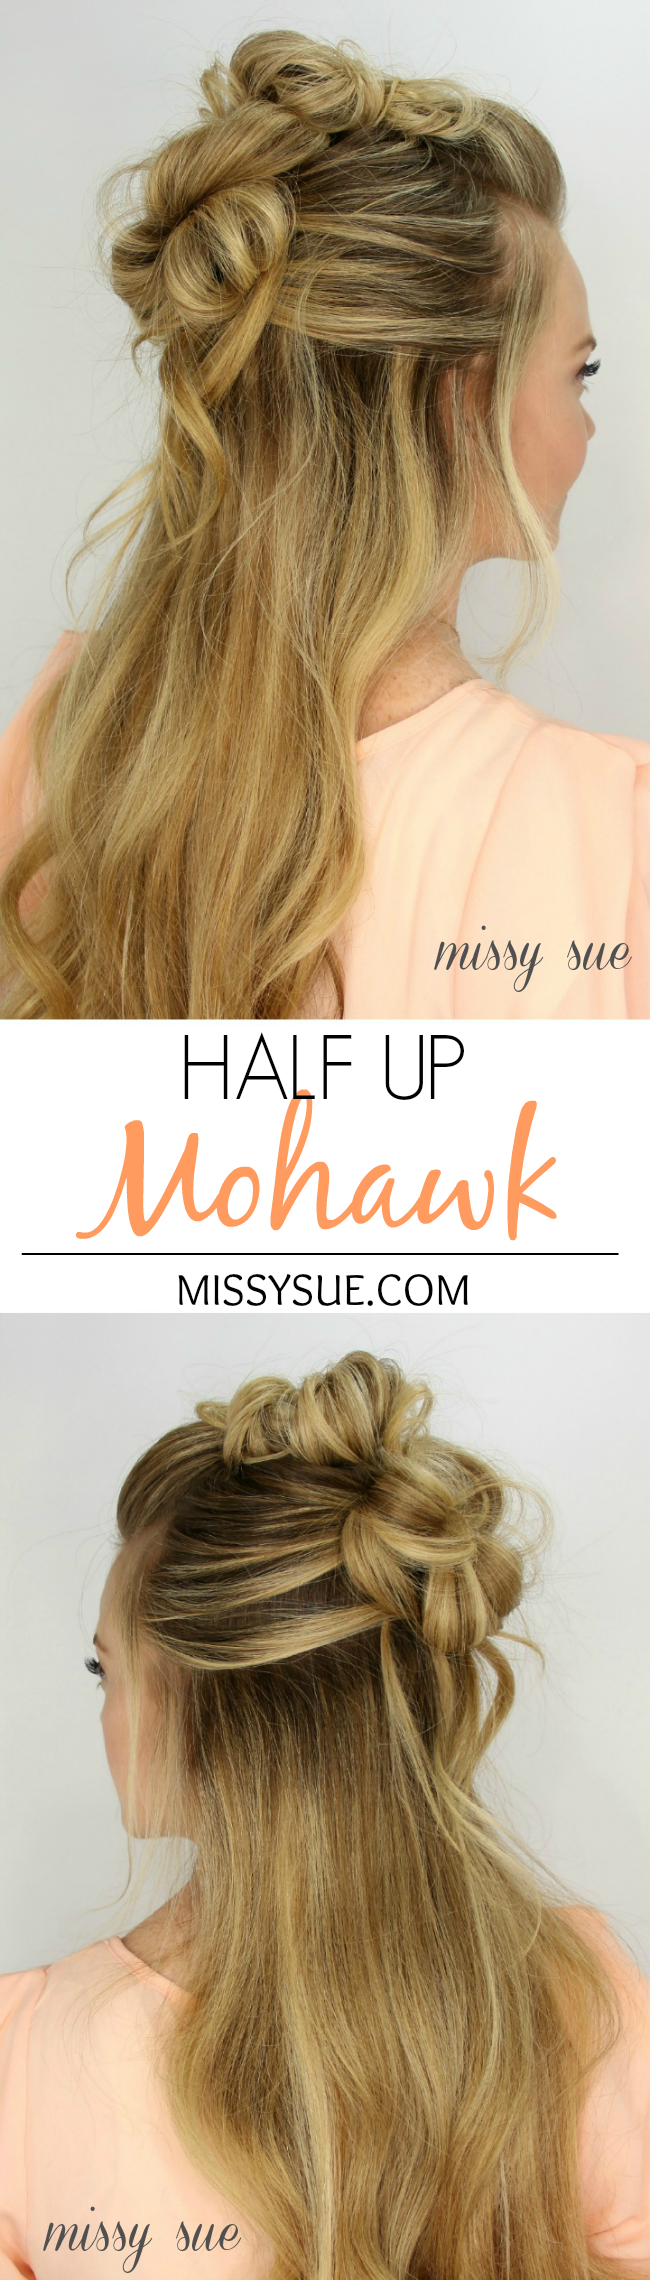 Halfupmessybunmohawk hair tutorials pinterest messy buns